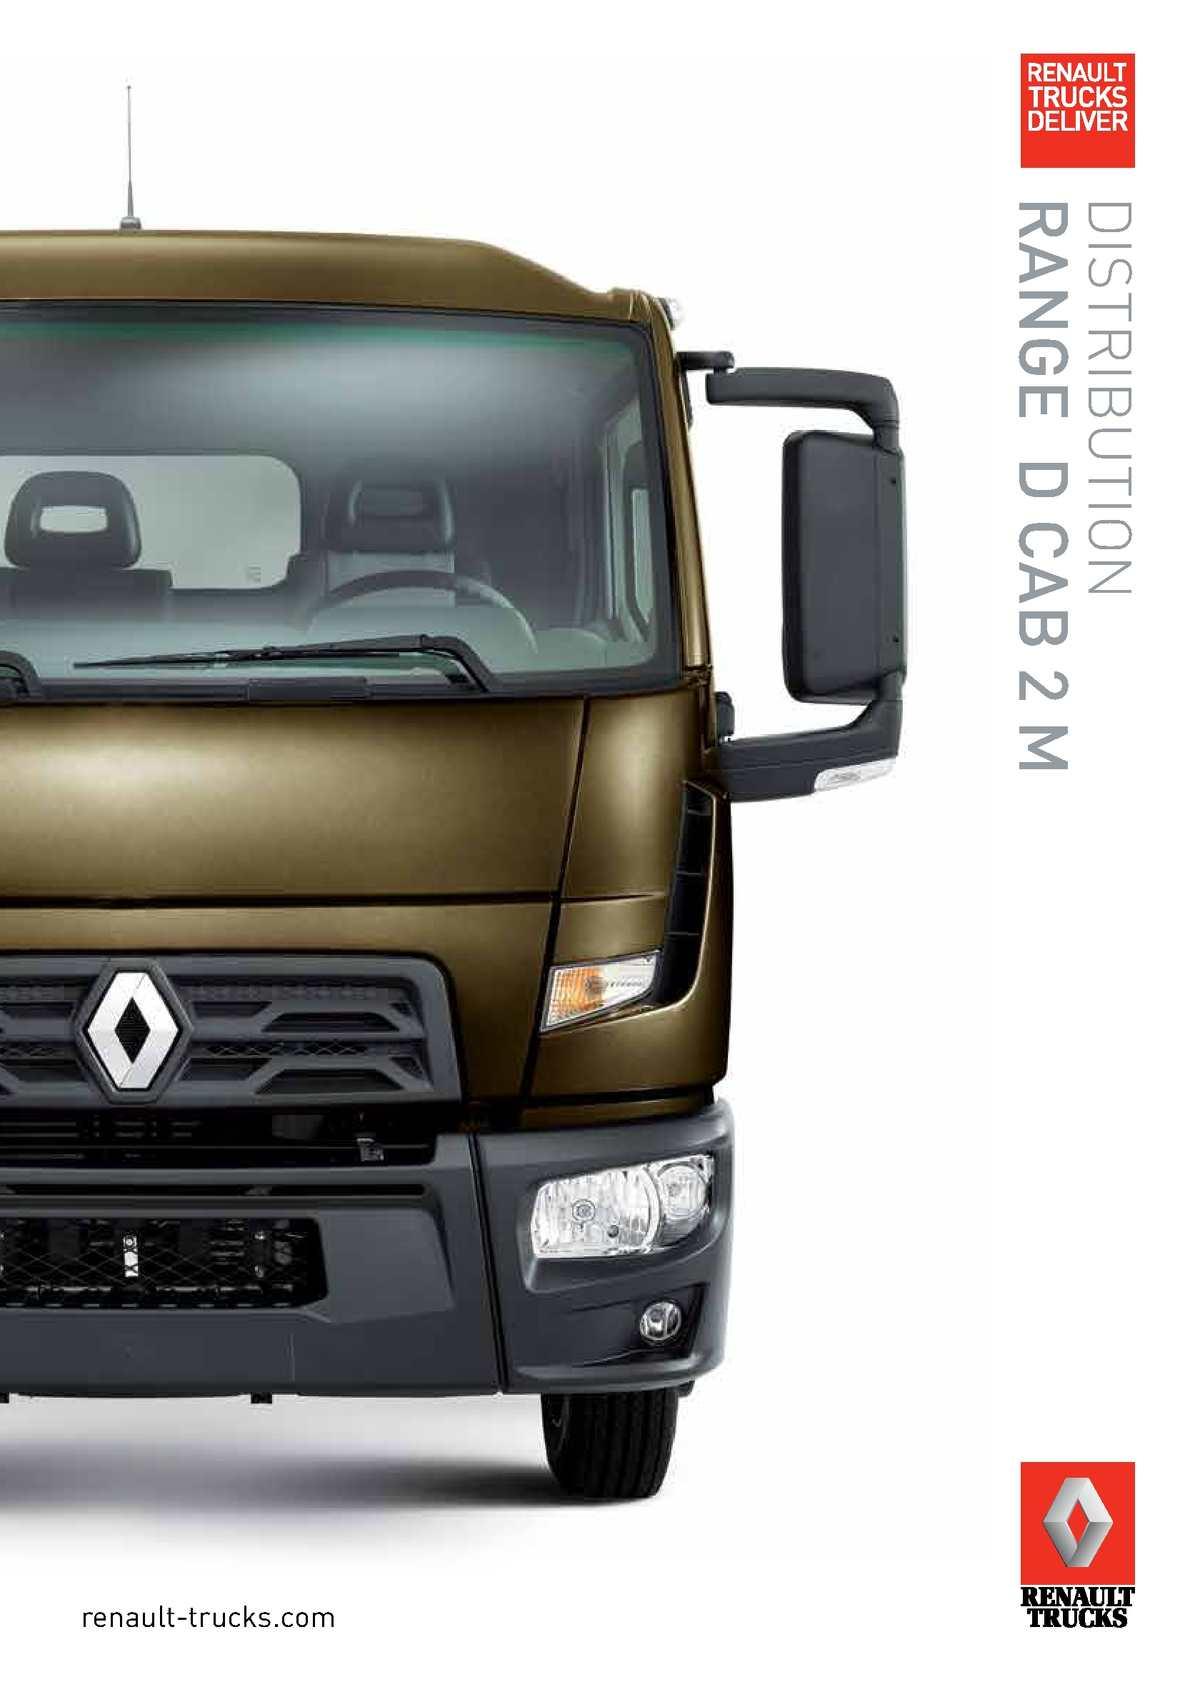 Calam o renault trucks d cab 2m distribution range 2014 for 2m distribution